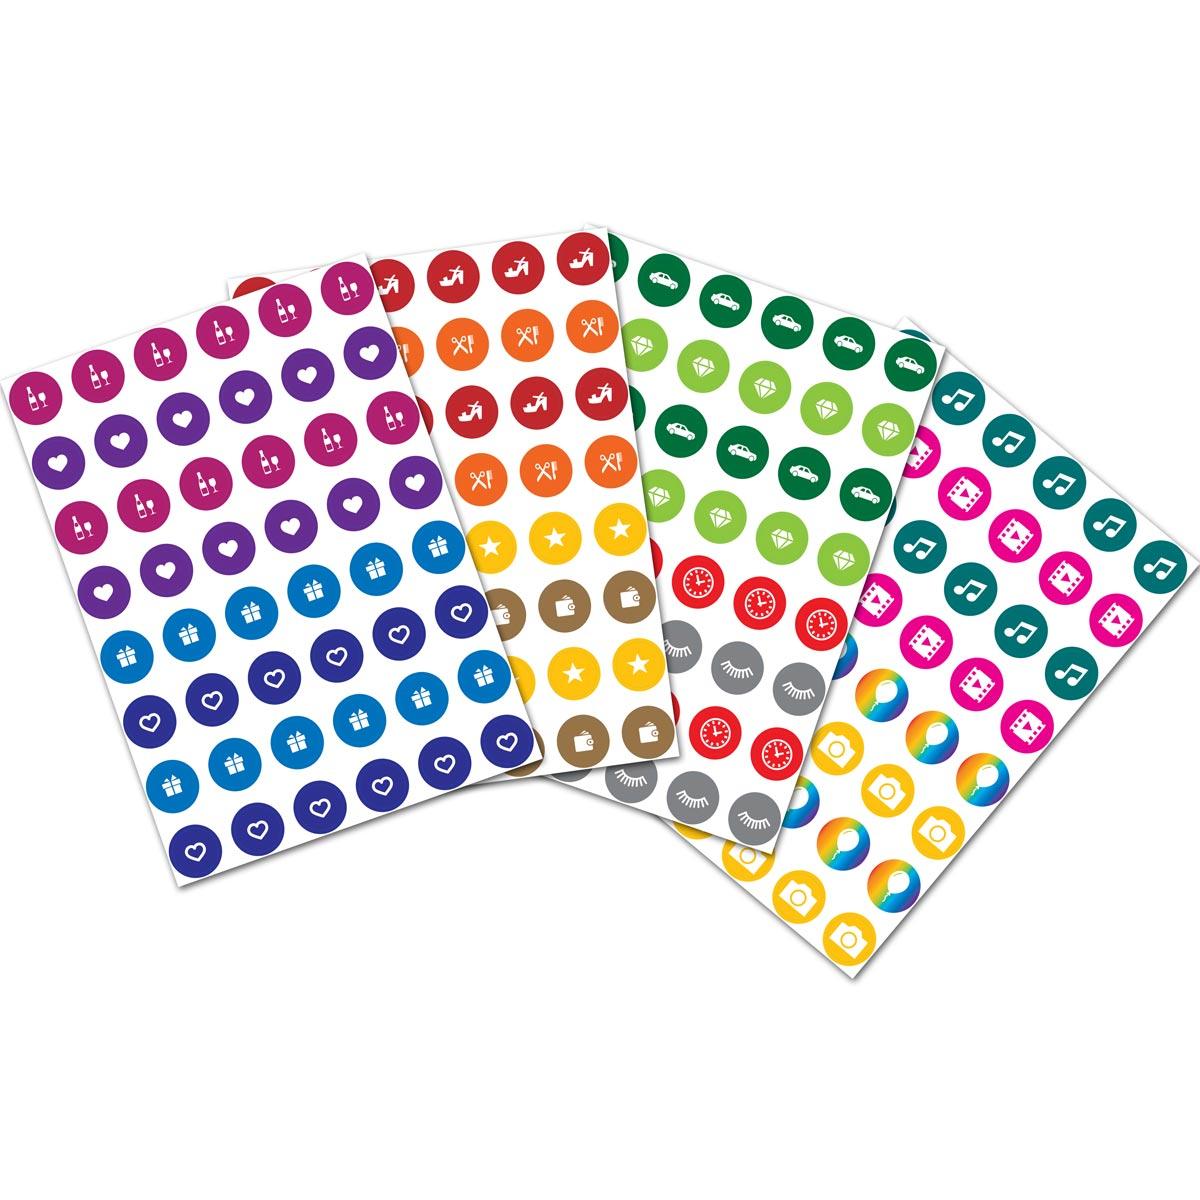 naklejki-dots-a6-tytulowe